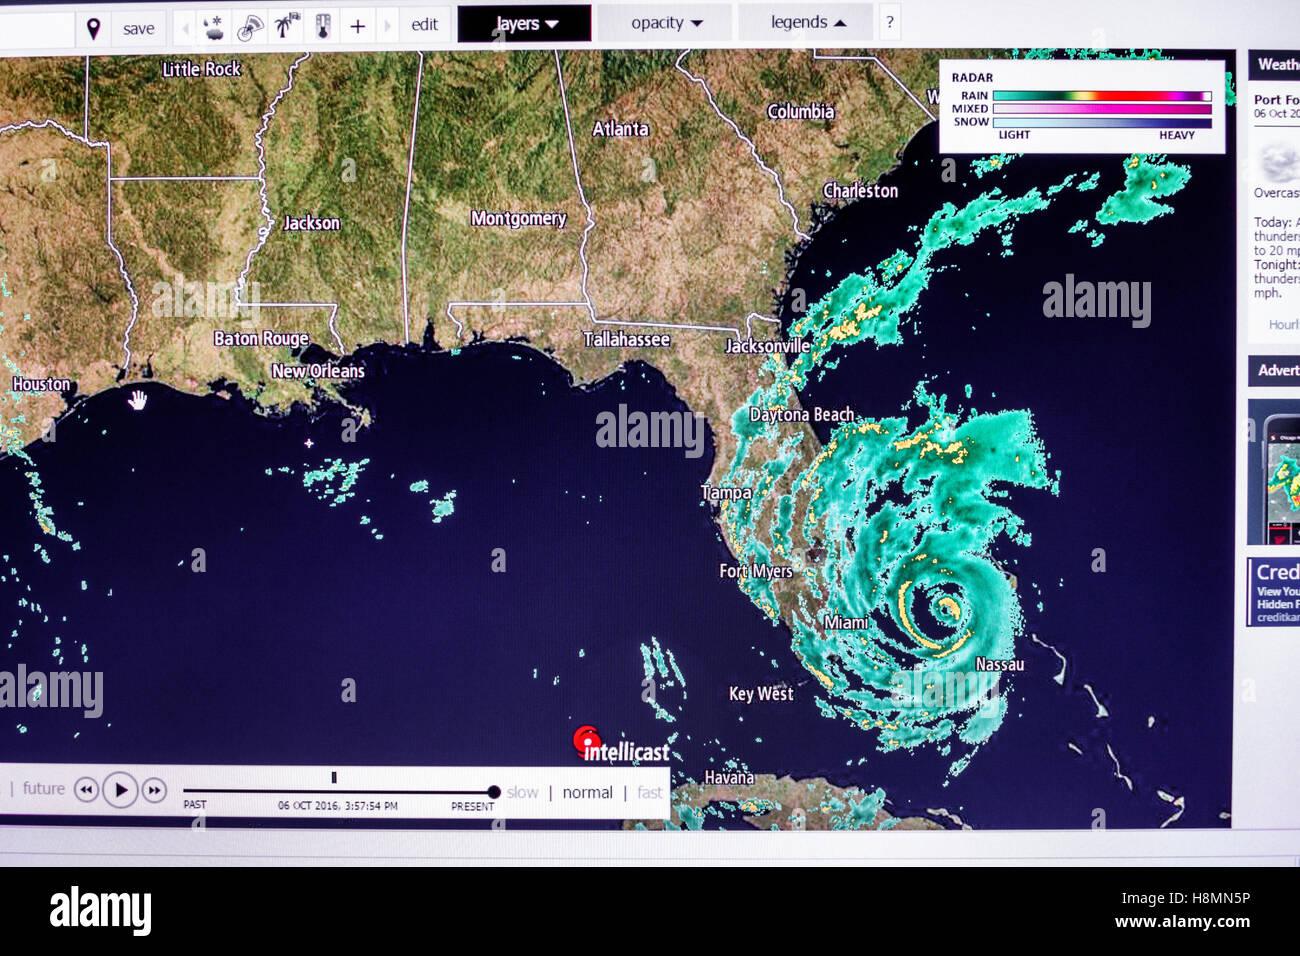 weather miami radar map Radar Map High Resolution Stock Photography And Images Alamy weather miami radar map